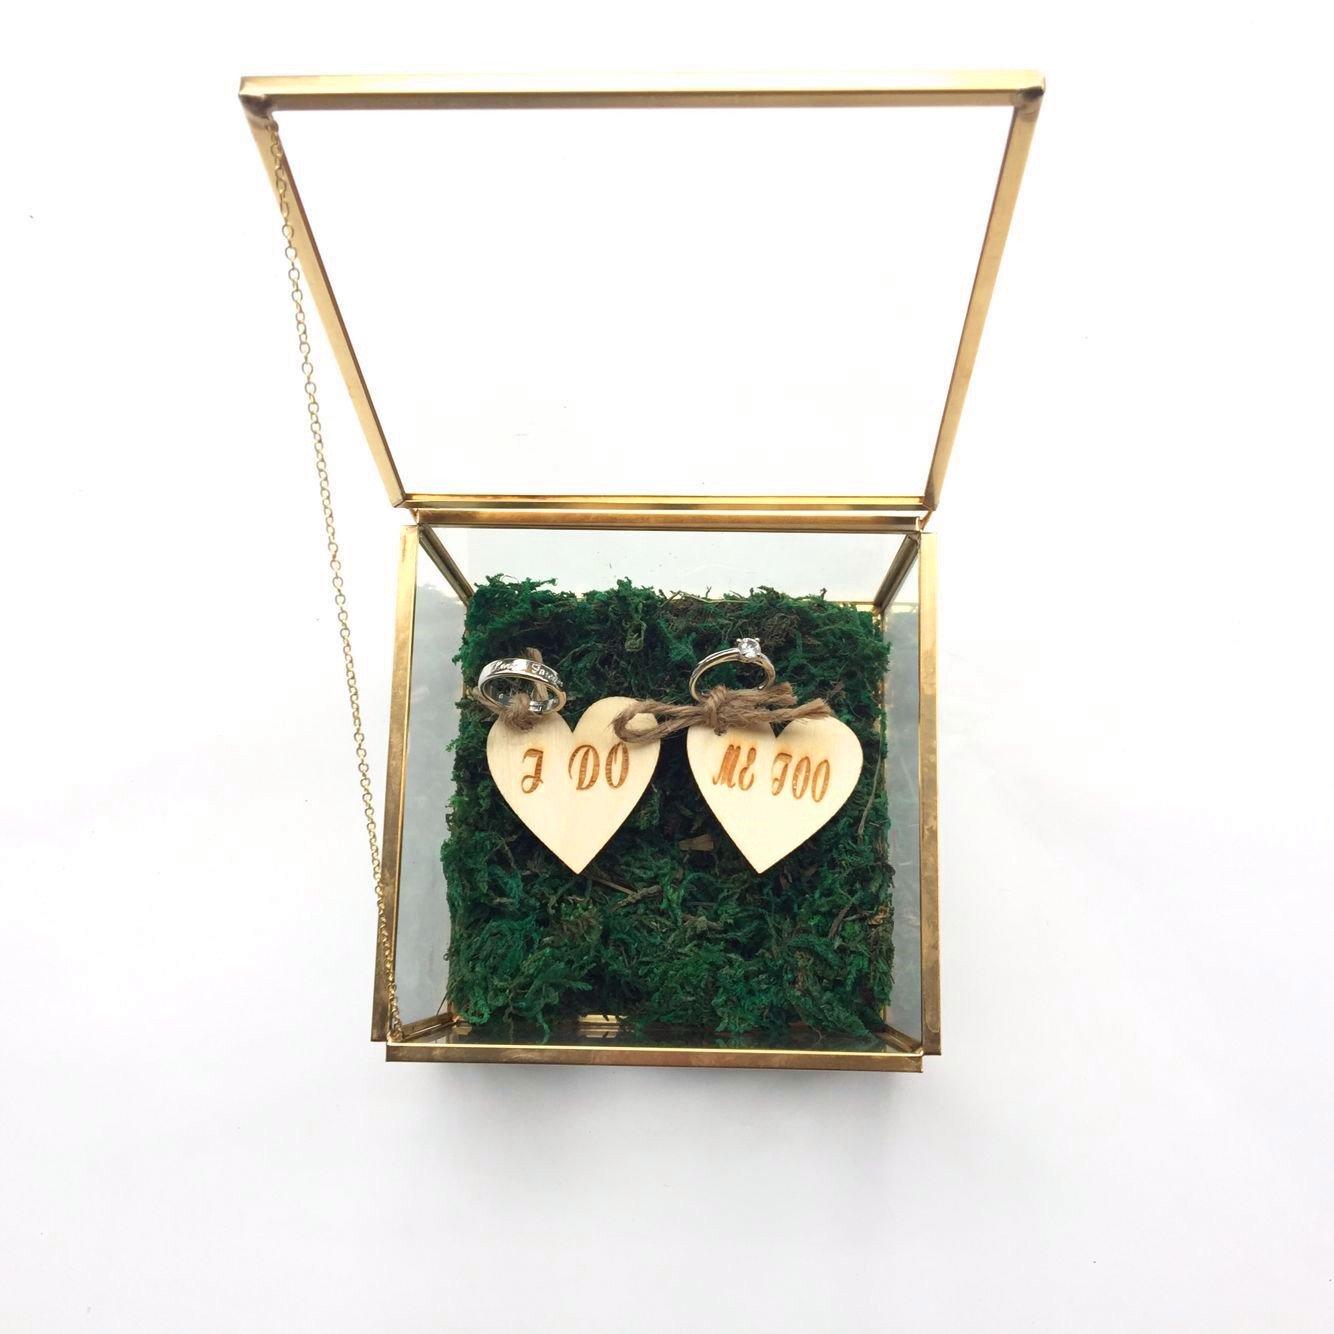 I Do Me Too - Caja de cristal rústica para anillos de boda, caja de anillos, anillo de cristal, soporte para anillos, caja para anillo de boda, caja para anillo de propuesta: